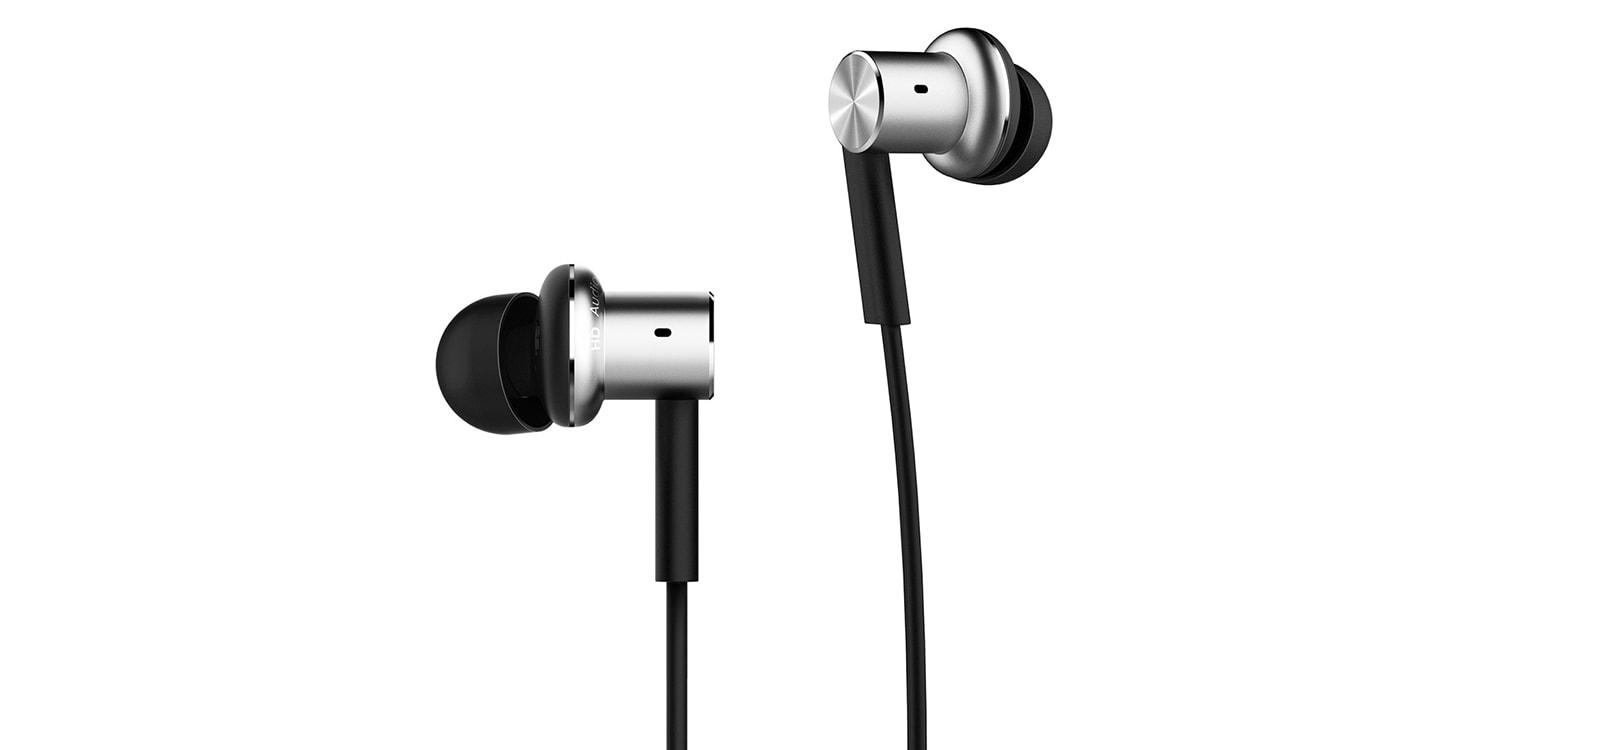 Стерео-наушники Xiaomi Hybrid Dual Drivers Earphones (QTER01JY) Silver/Black